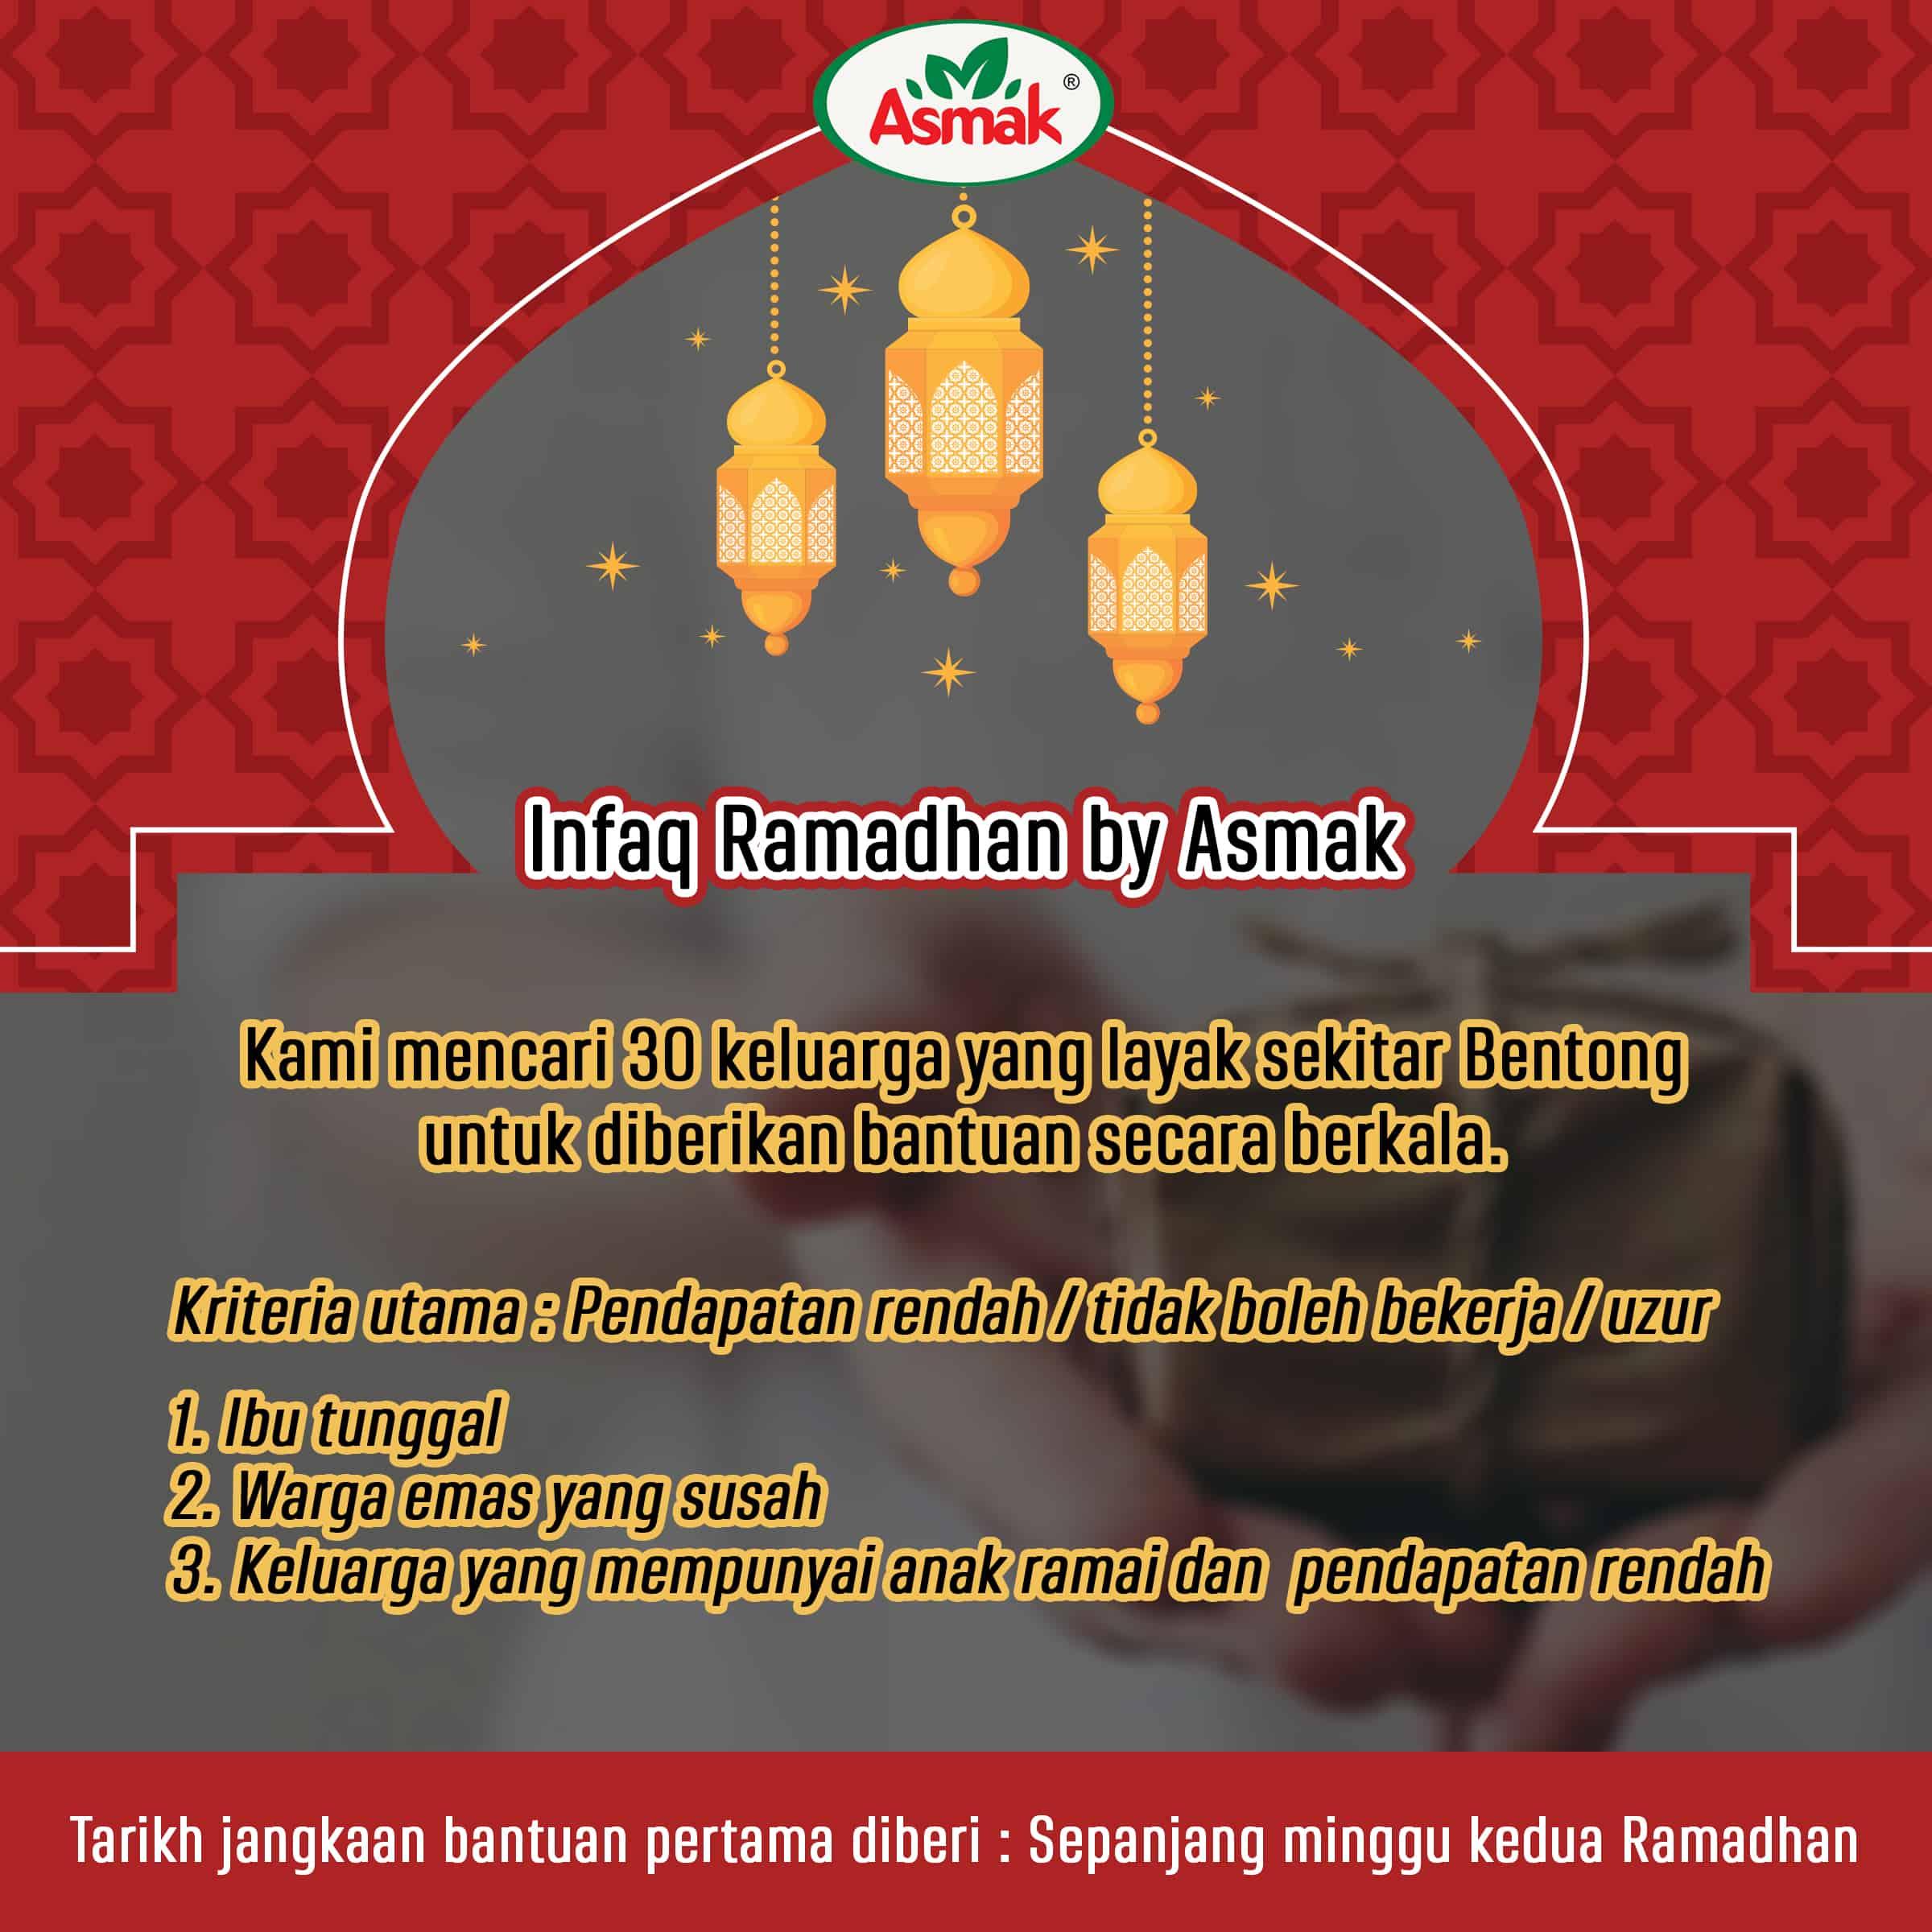 Infaq Ramadhan by Asmak